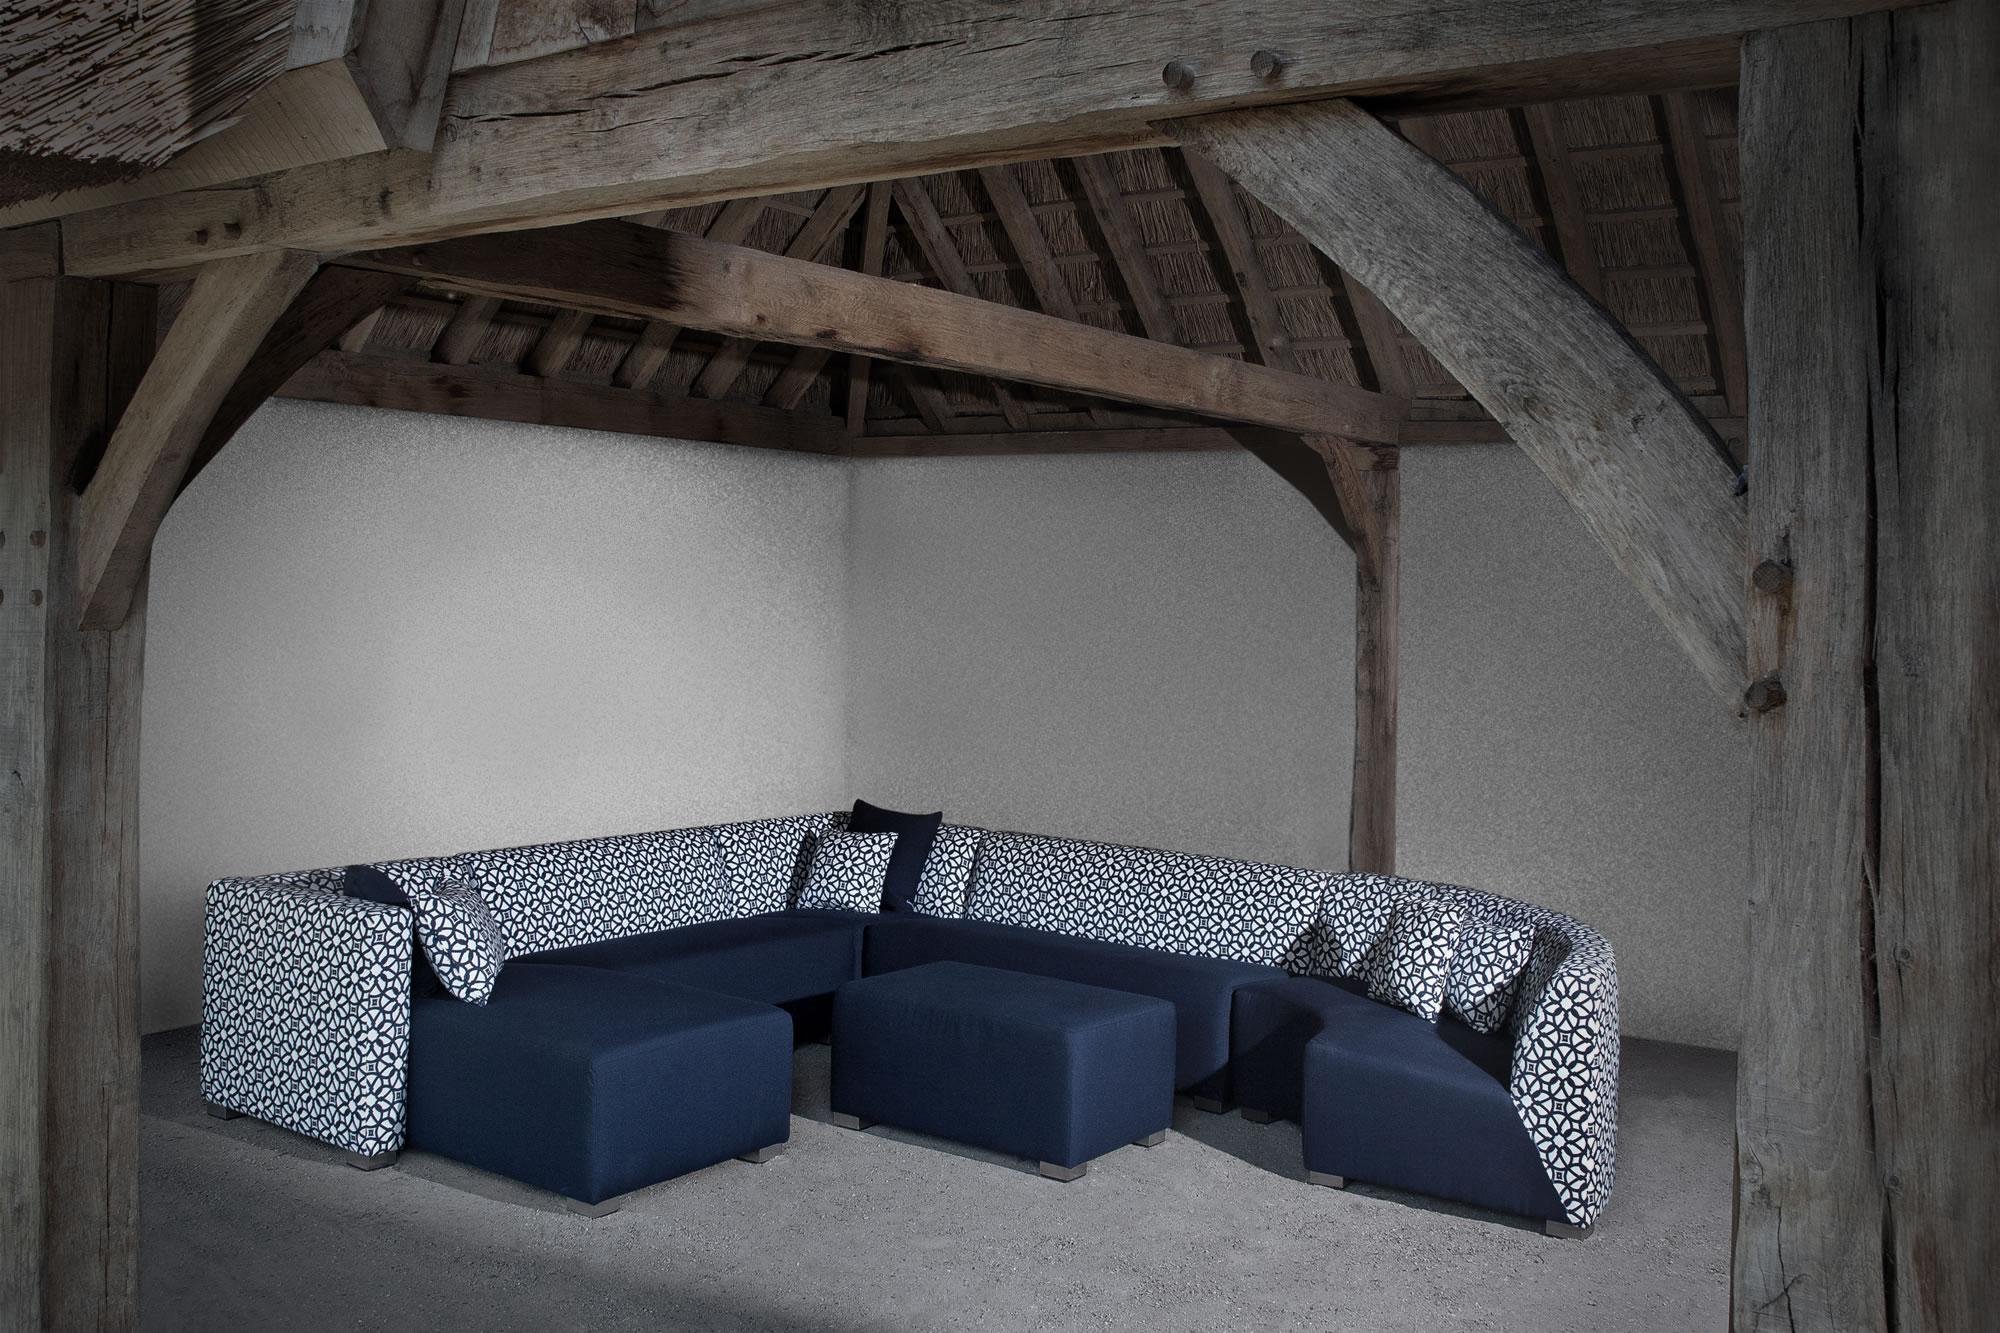 Design chil square loungehoek ernst baas tuininrichting design